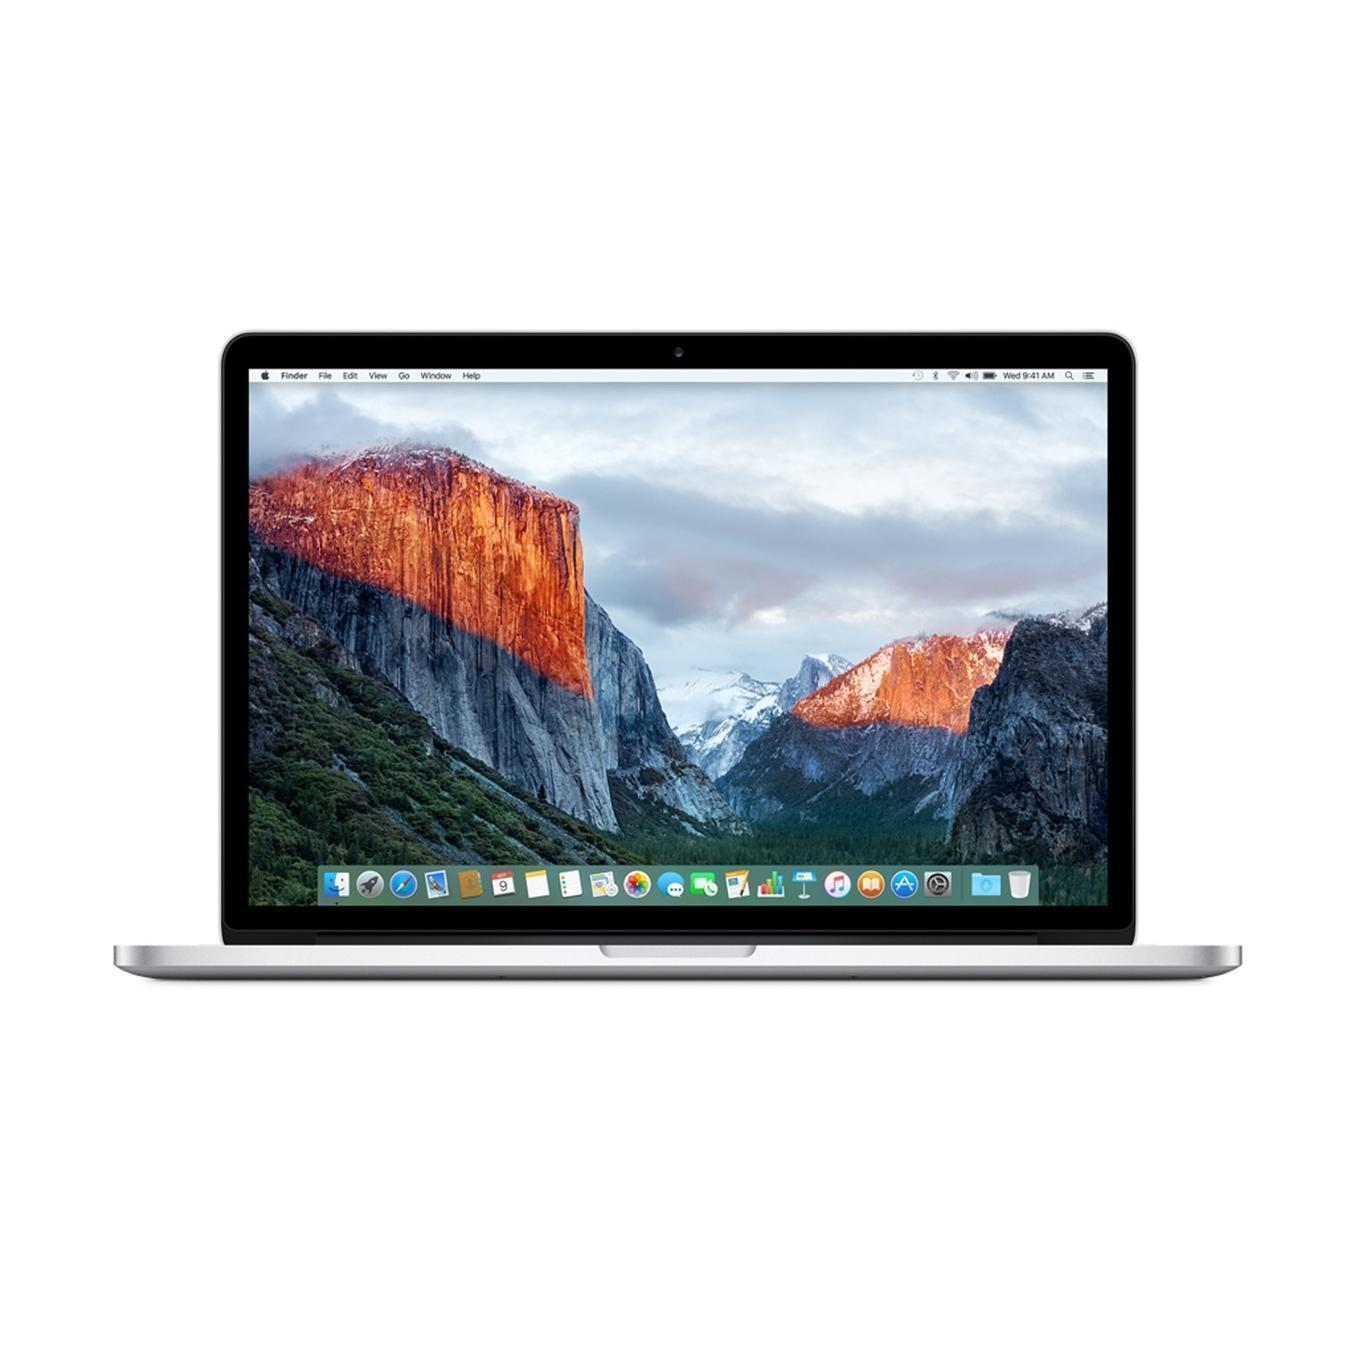 MacBook Pro Retina 15.4-inch (2012) - Core i7 - 16GB - SSD 512 GB QWERTY